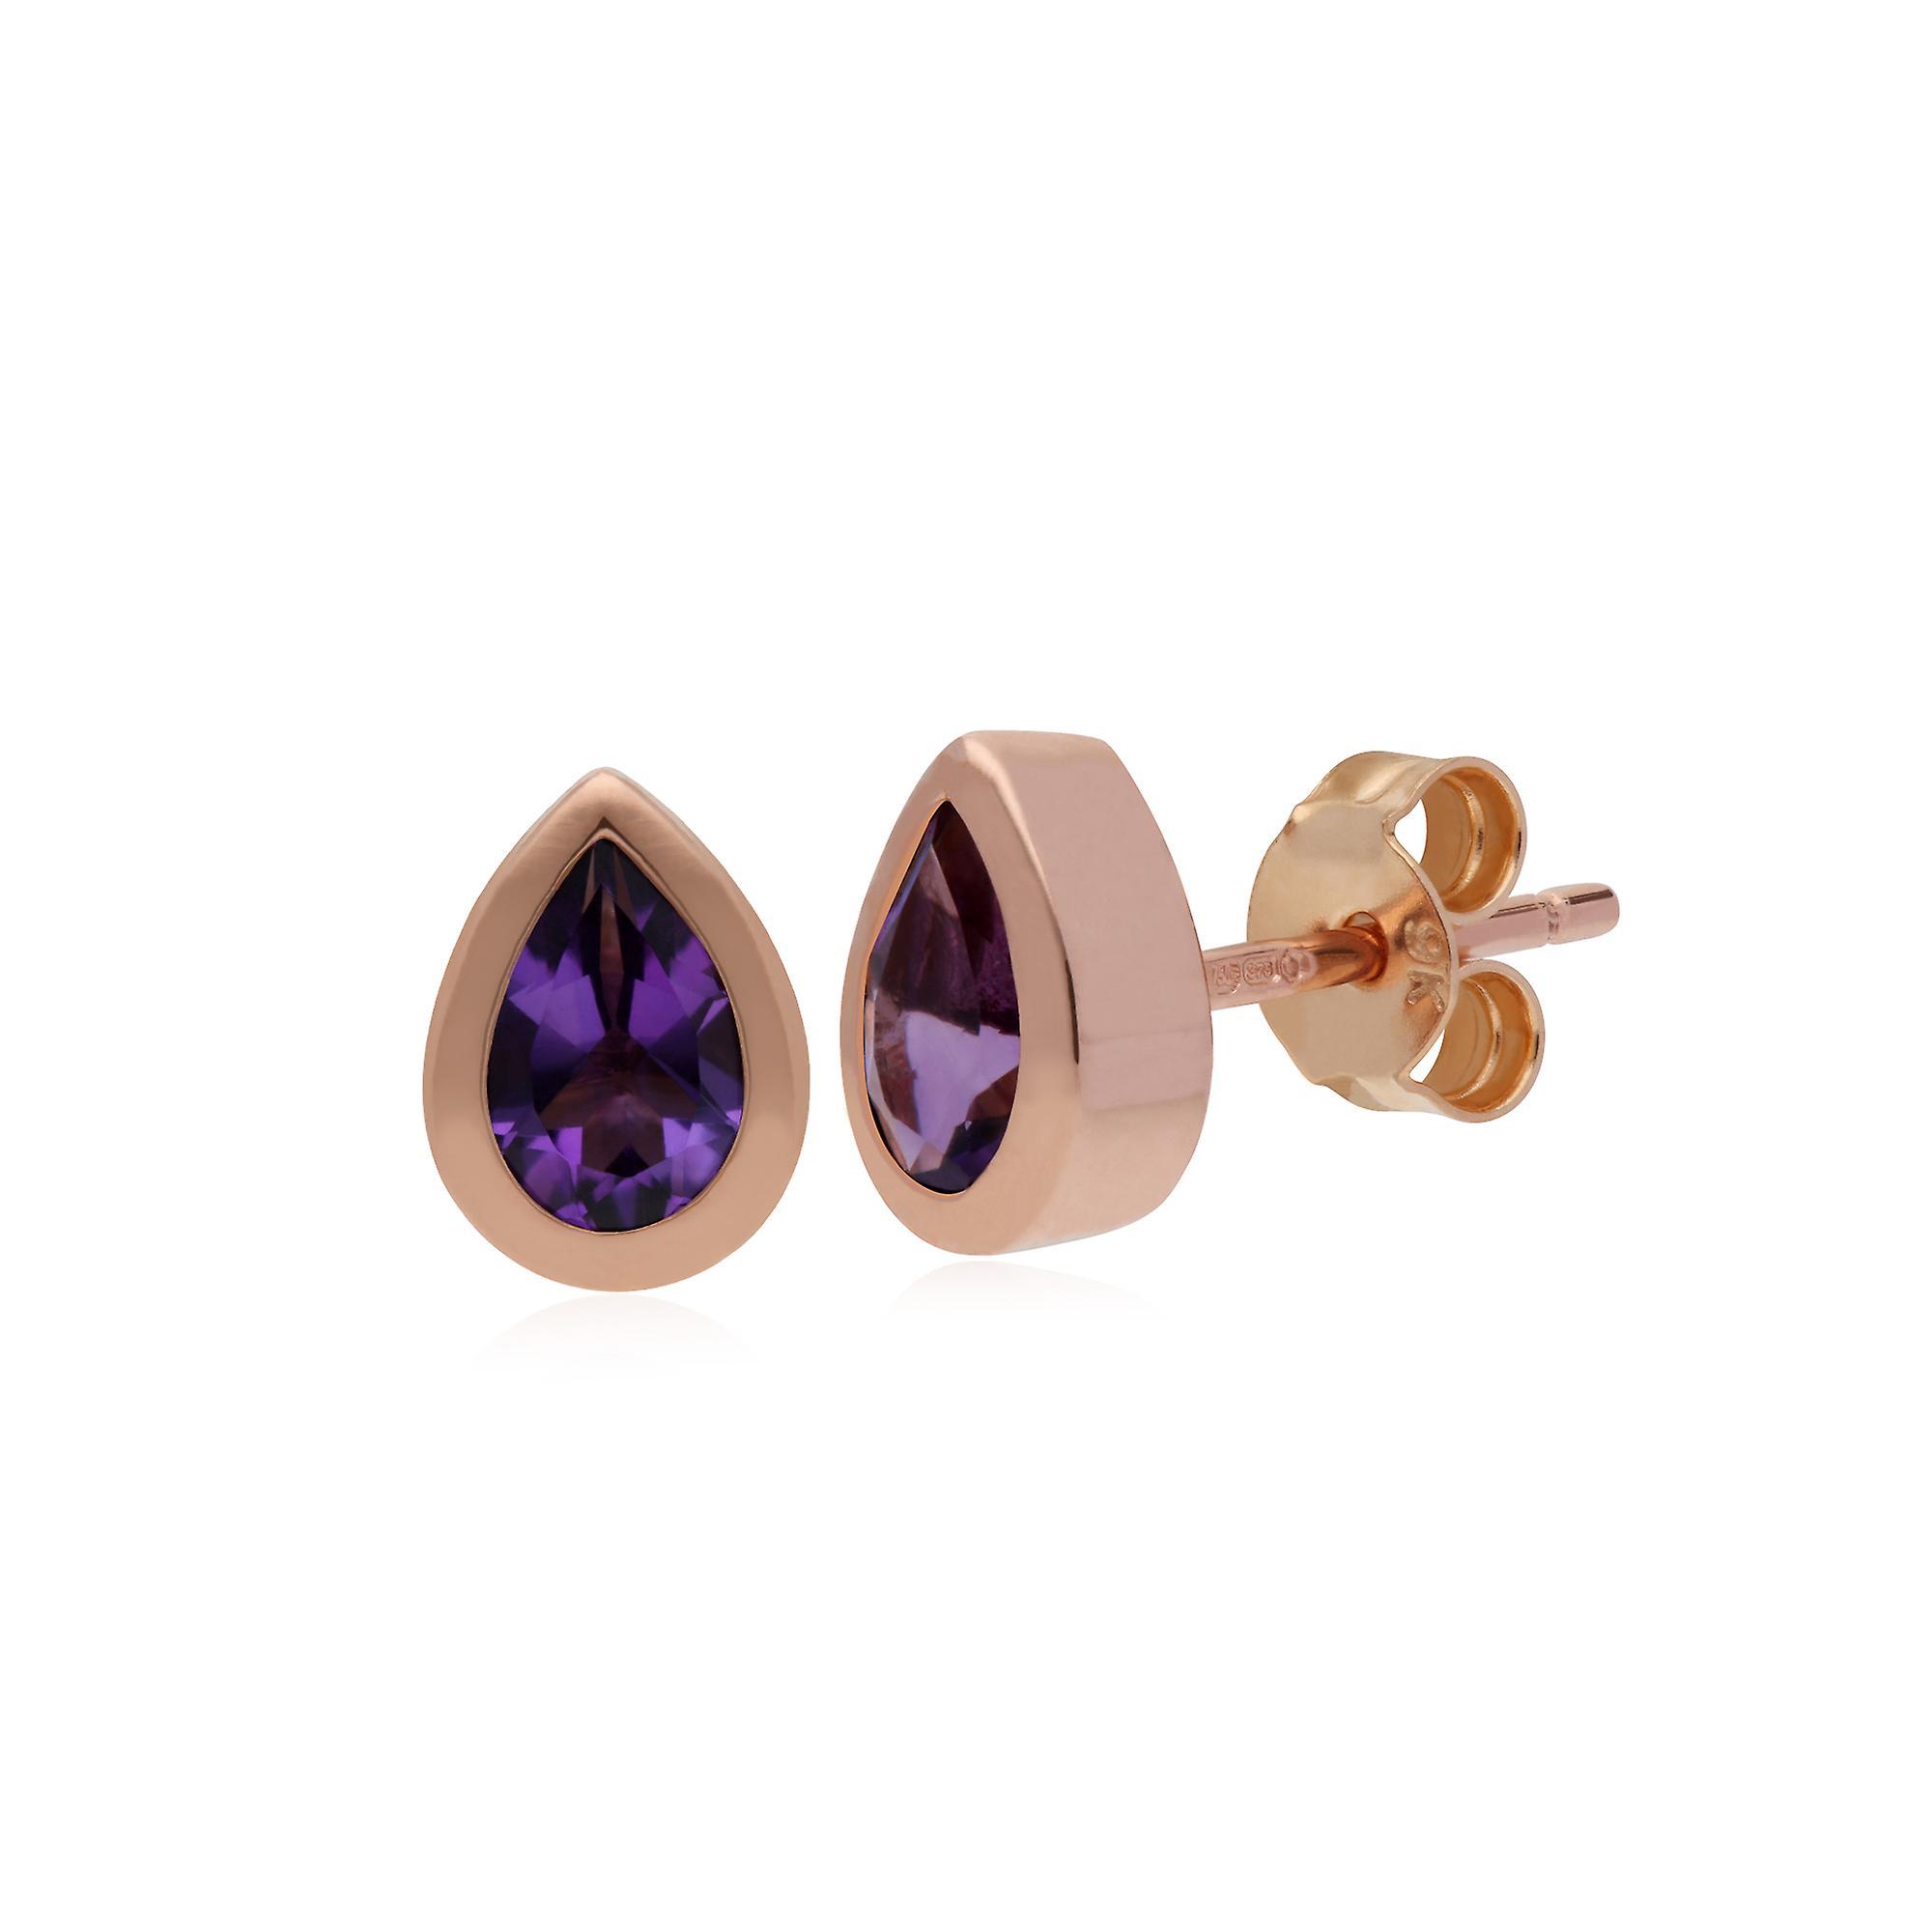 9ct Rose Gold Amethyst Classic Pear Stud Earrings